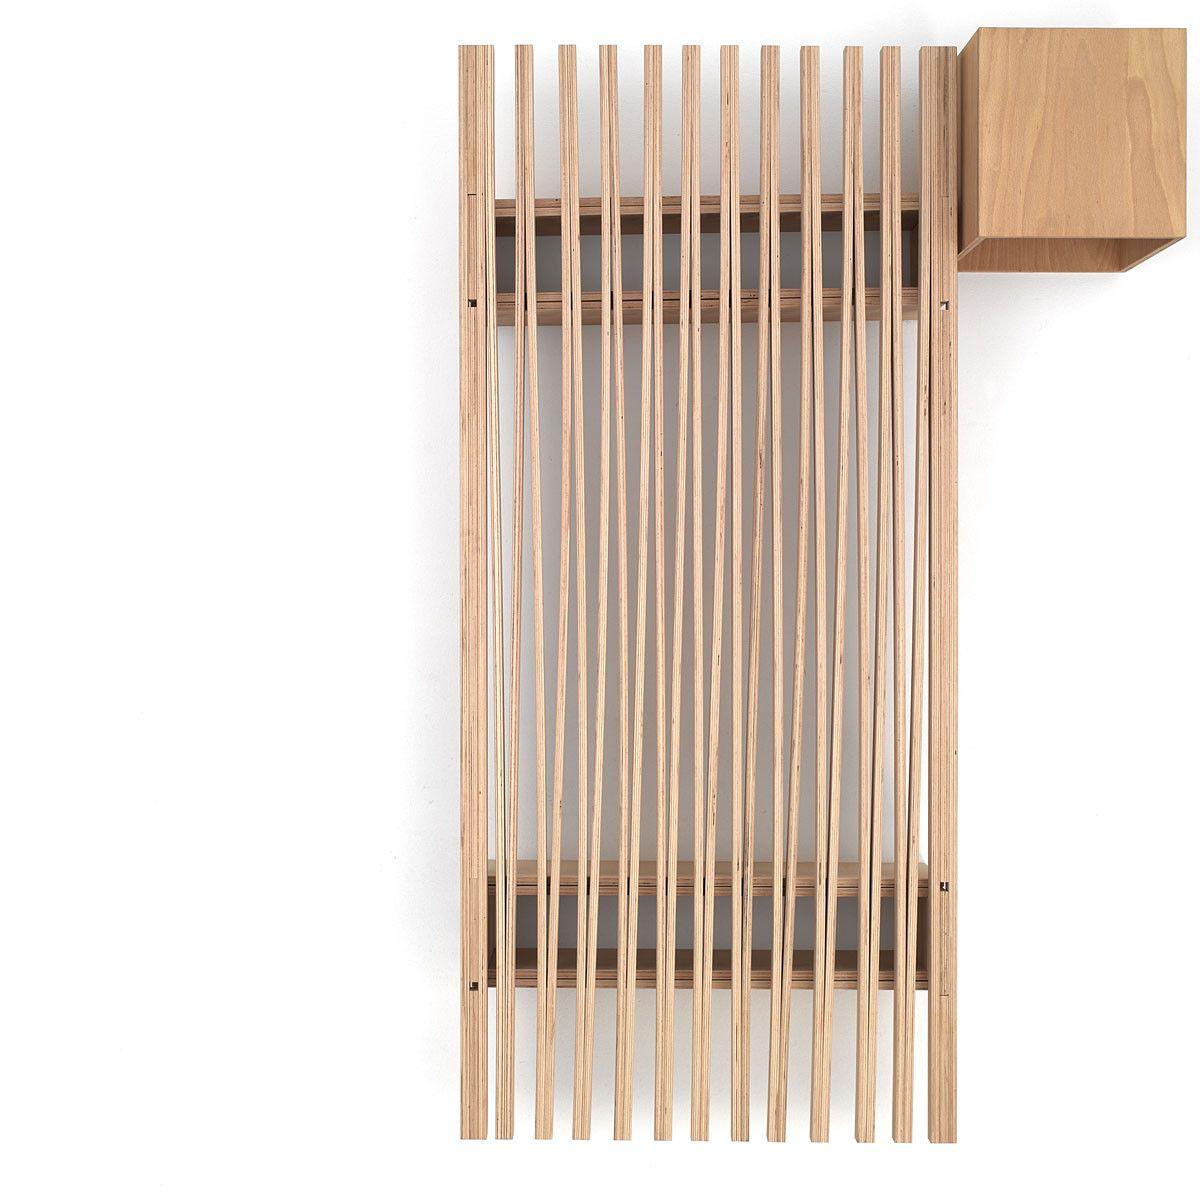 "v"" Bett, 90 bis 180 cm Bed frame, Foldable bed, Folding"